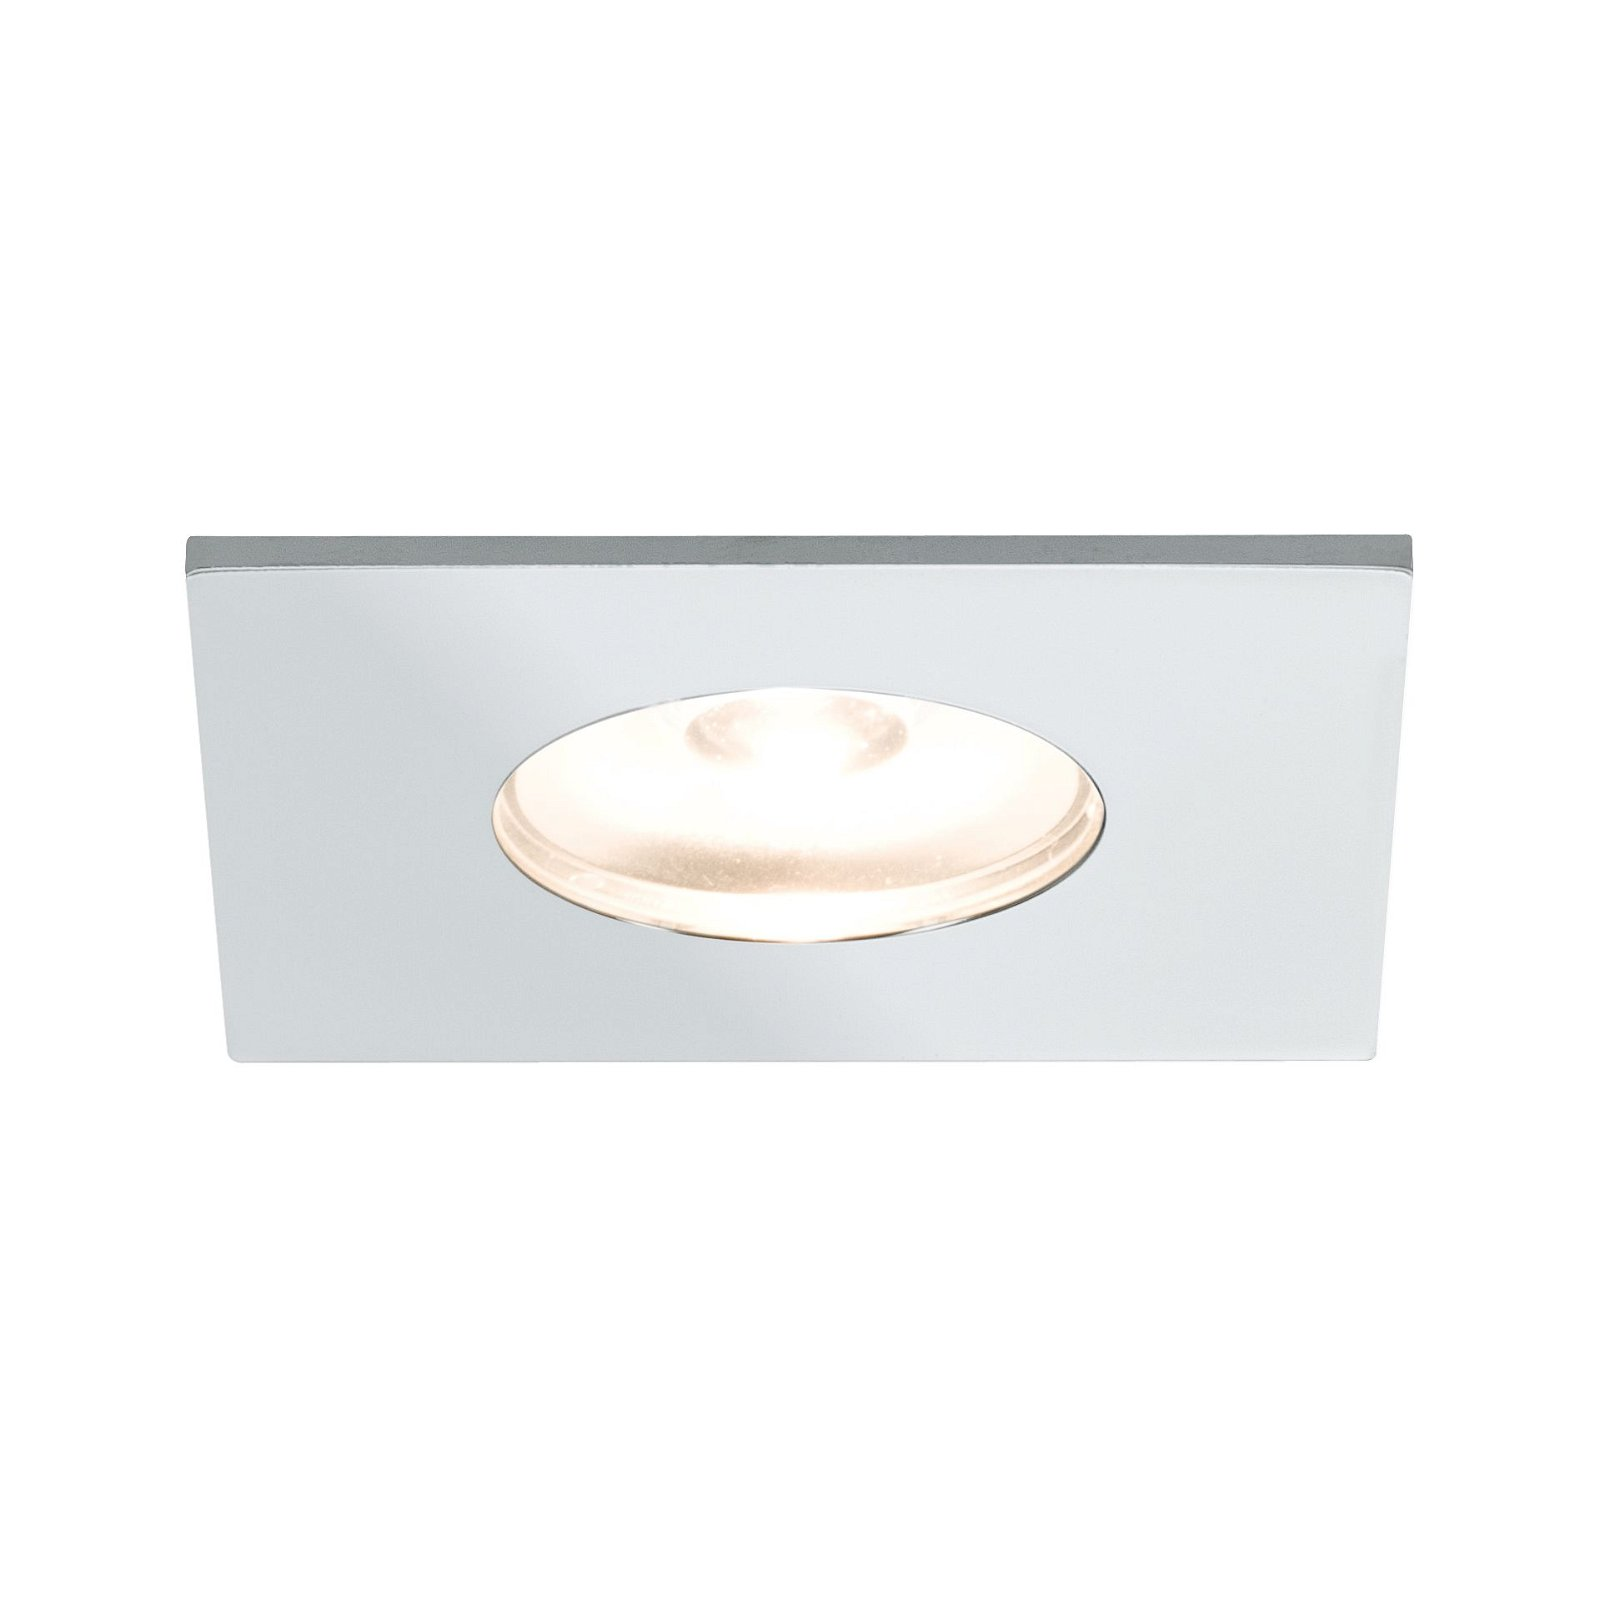 LED-meubelinbouwlampen Micro Line Mini hoekig 35x35mm 5x1W 5x110lm 230V 2700K Chroom